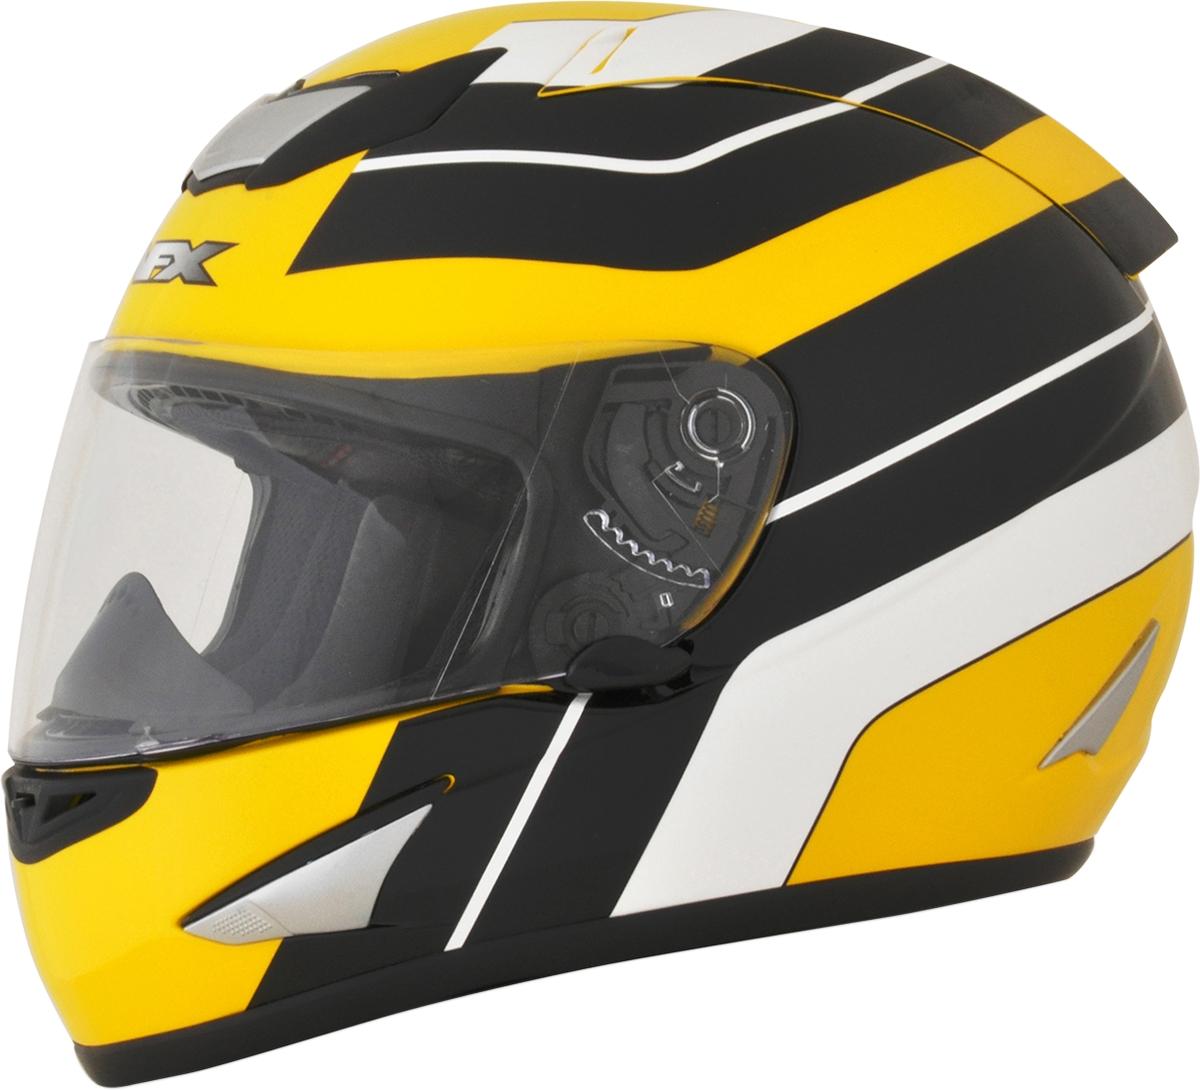 FX95 Full-Face Helmet Vintage Yamaha Graphics